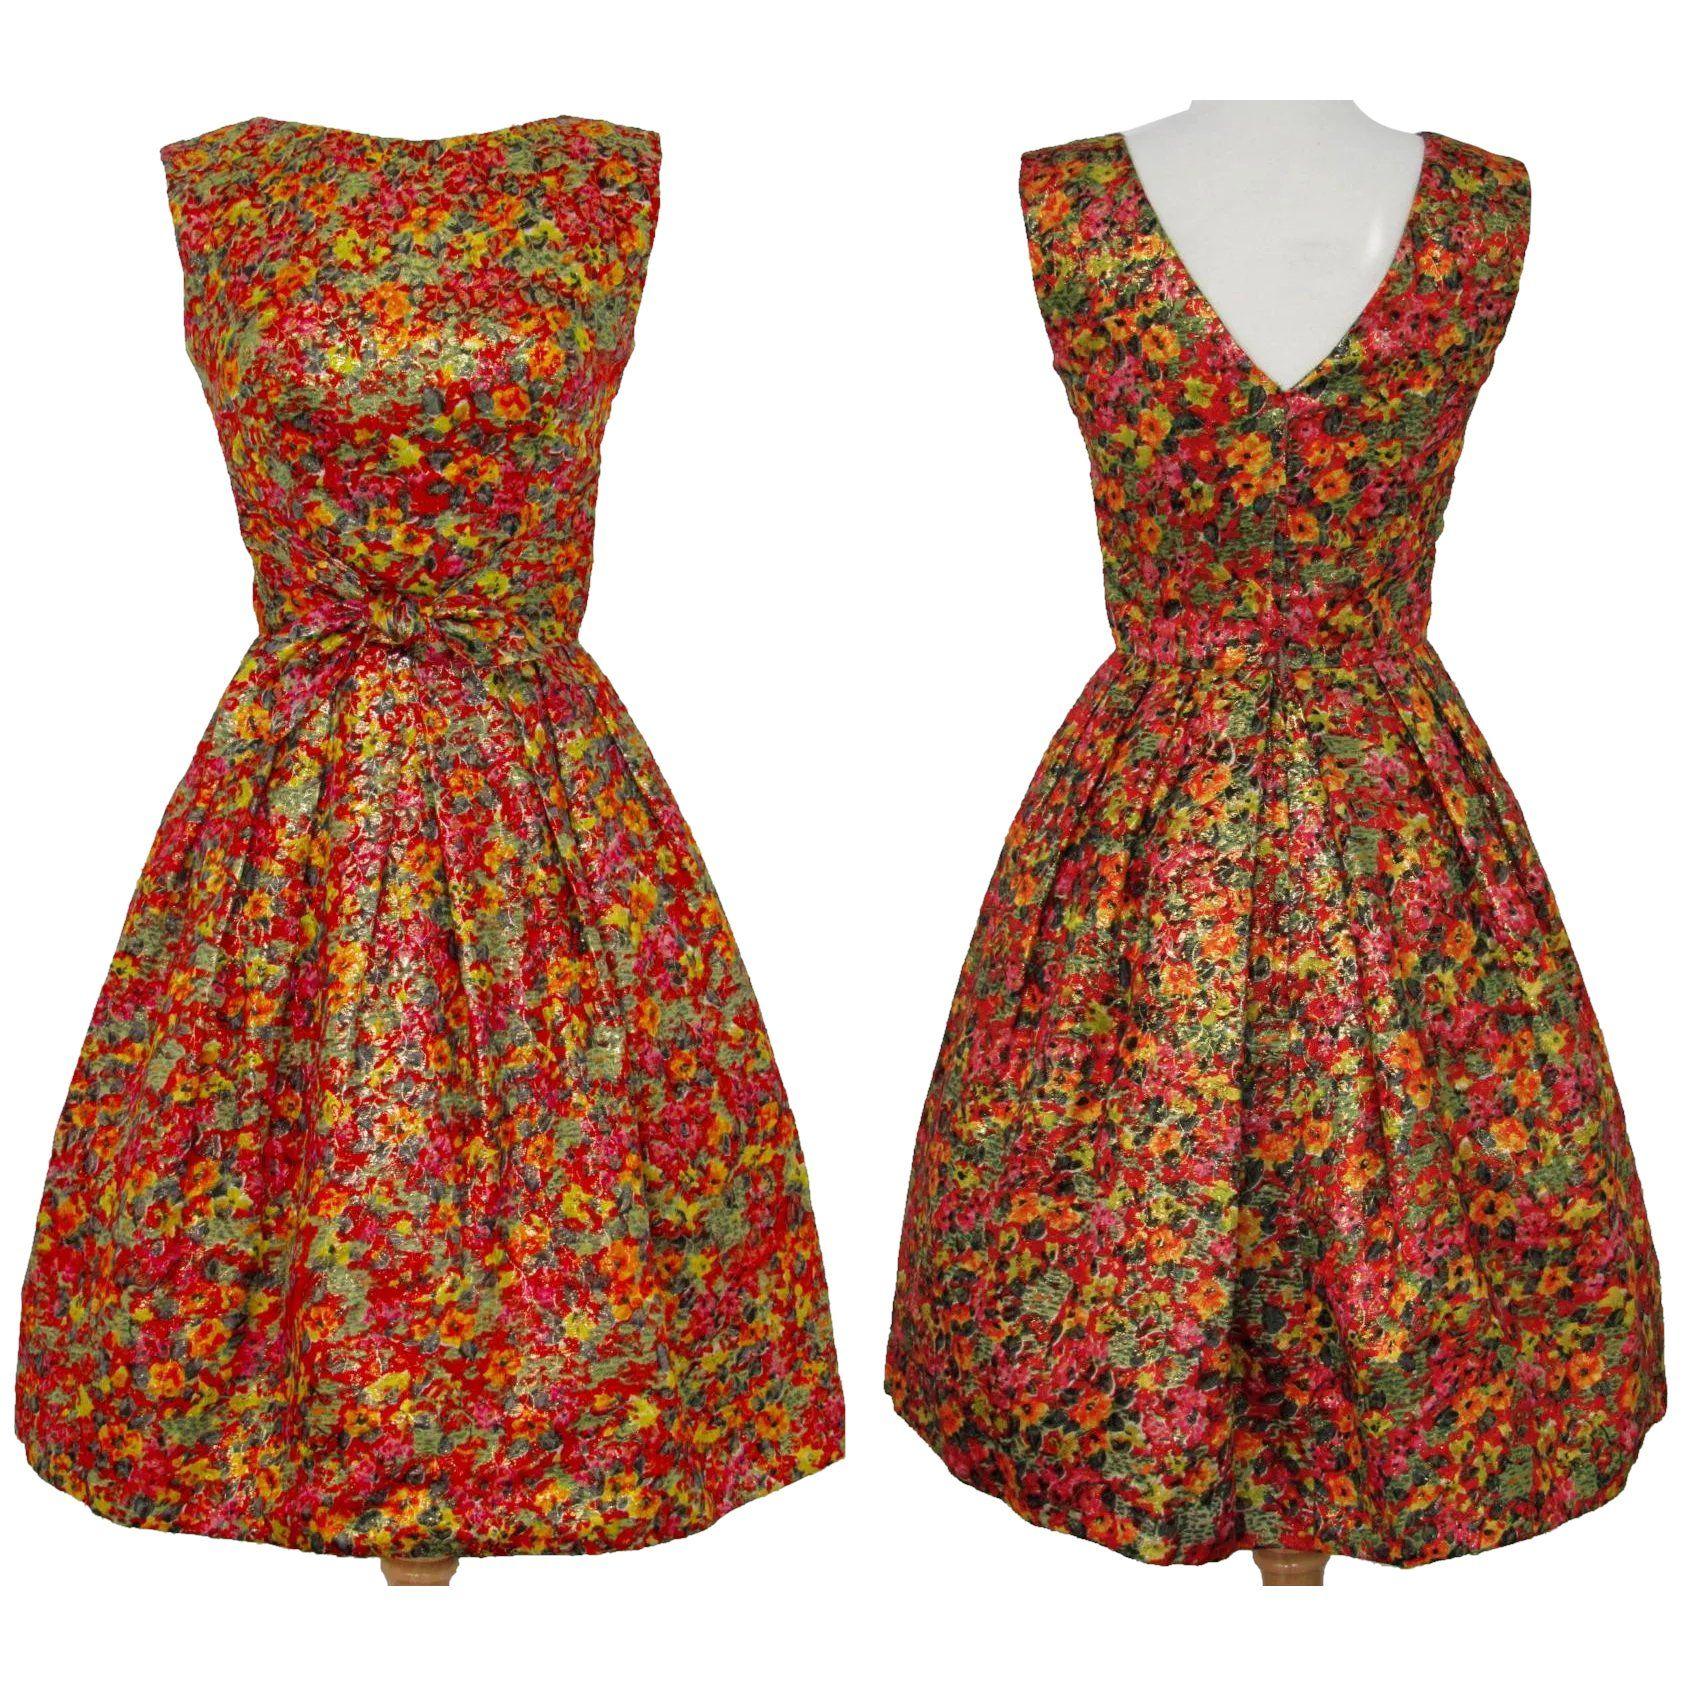 39d9a04074e Vintage 1950s Dress    Suzy Perette    50s Dress   New Look   Femme  Fatale  Rockabilly  Mad Man  Mod  Cocktail Dress